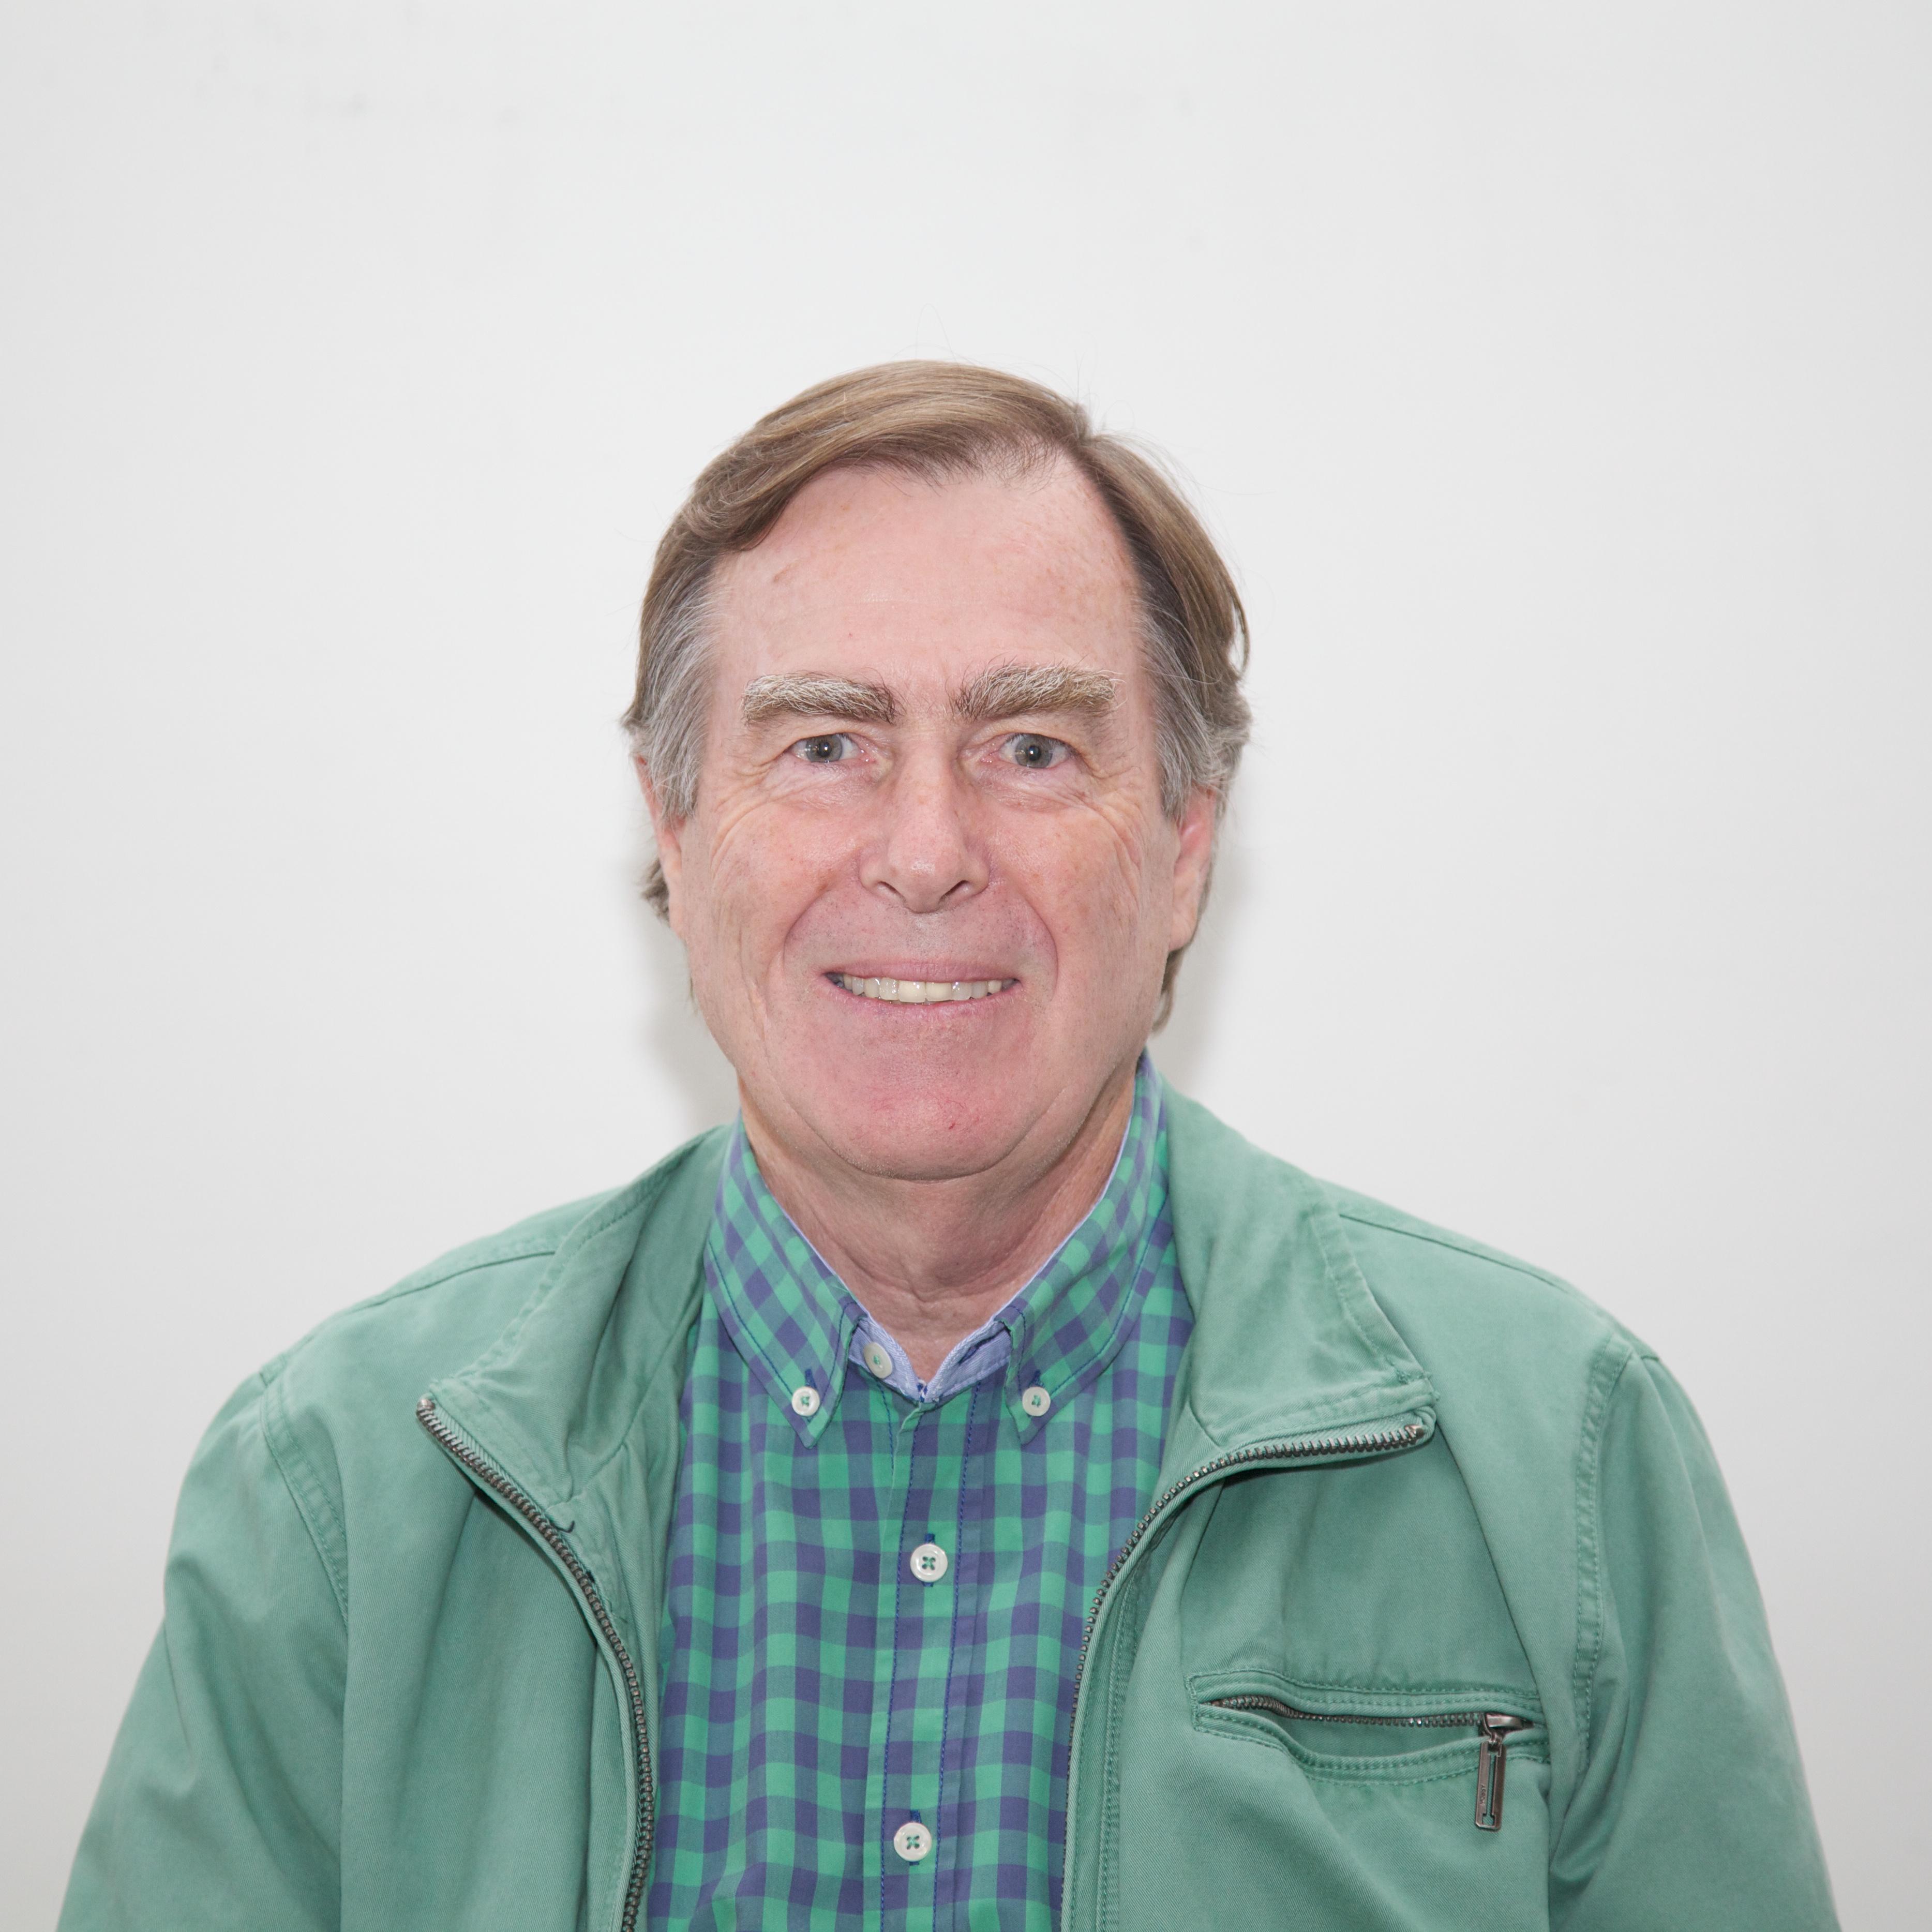 Roberto Morrison